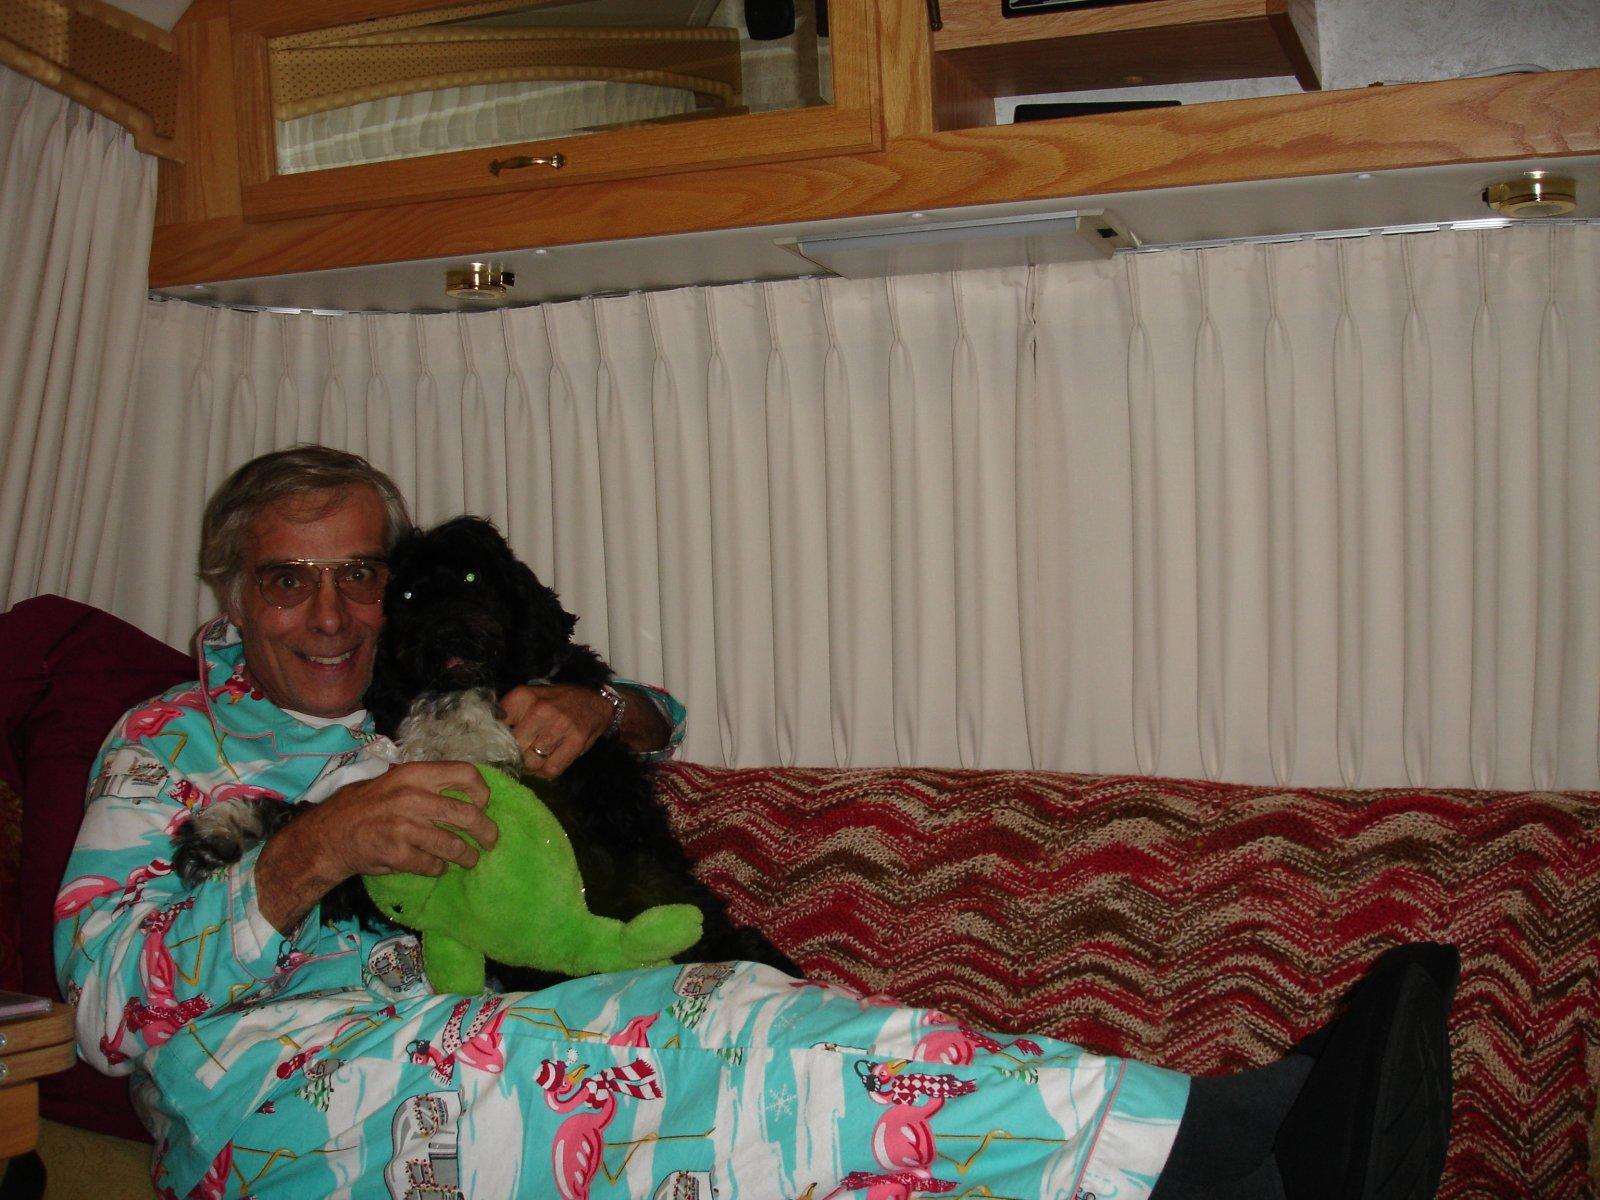 Click image for larger version  Name:Adirondack Leaf Peep'n October 2008 049.jpg Views:98 Size:305.0 KB ID:198692